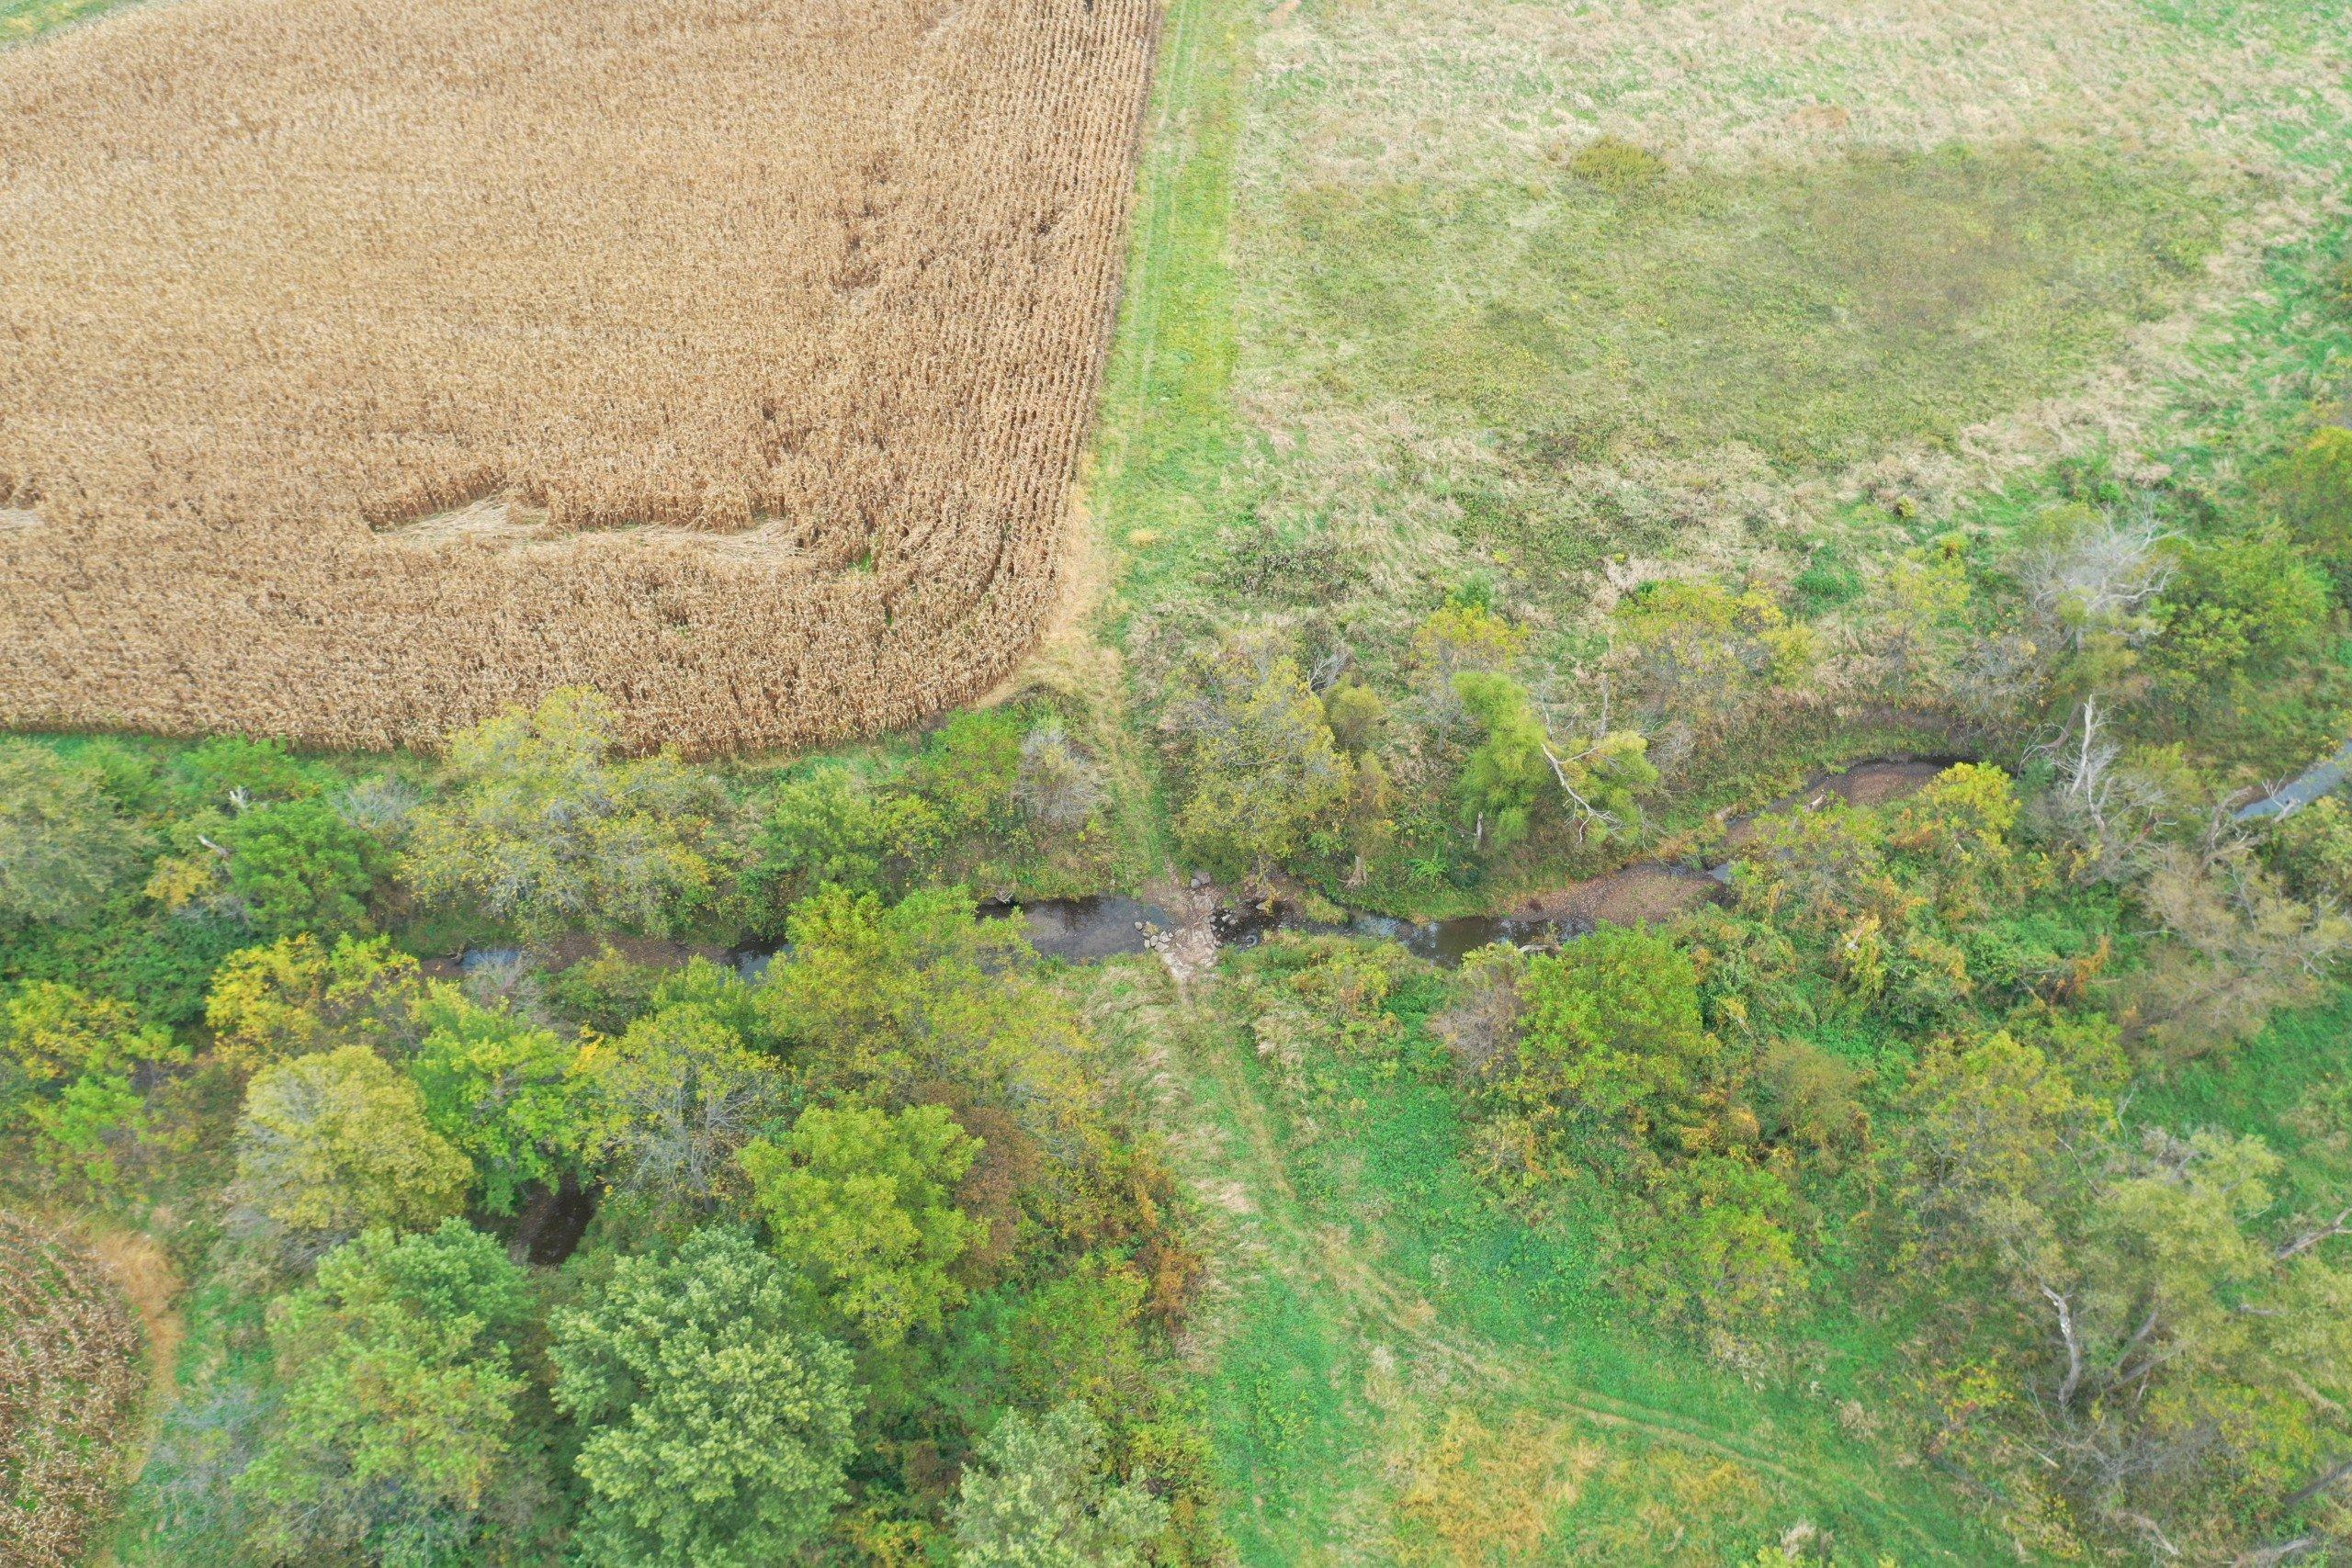 land-warren-county-iowa-200-acres-listing-number-15810-DJI_0592-3.jpg